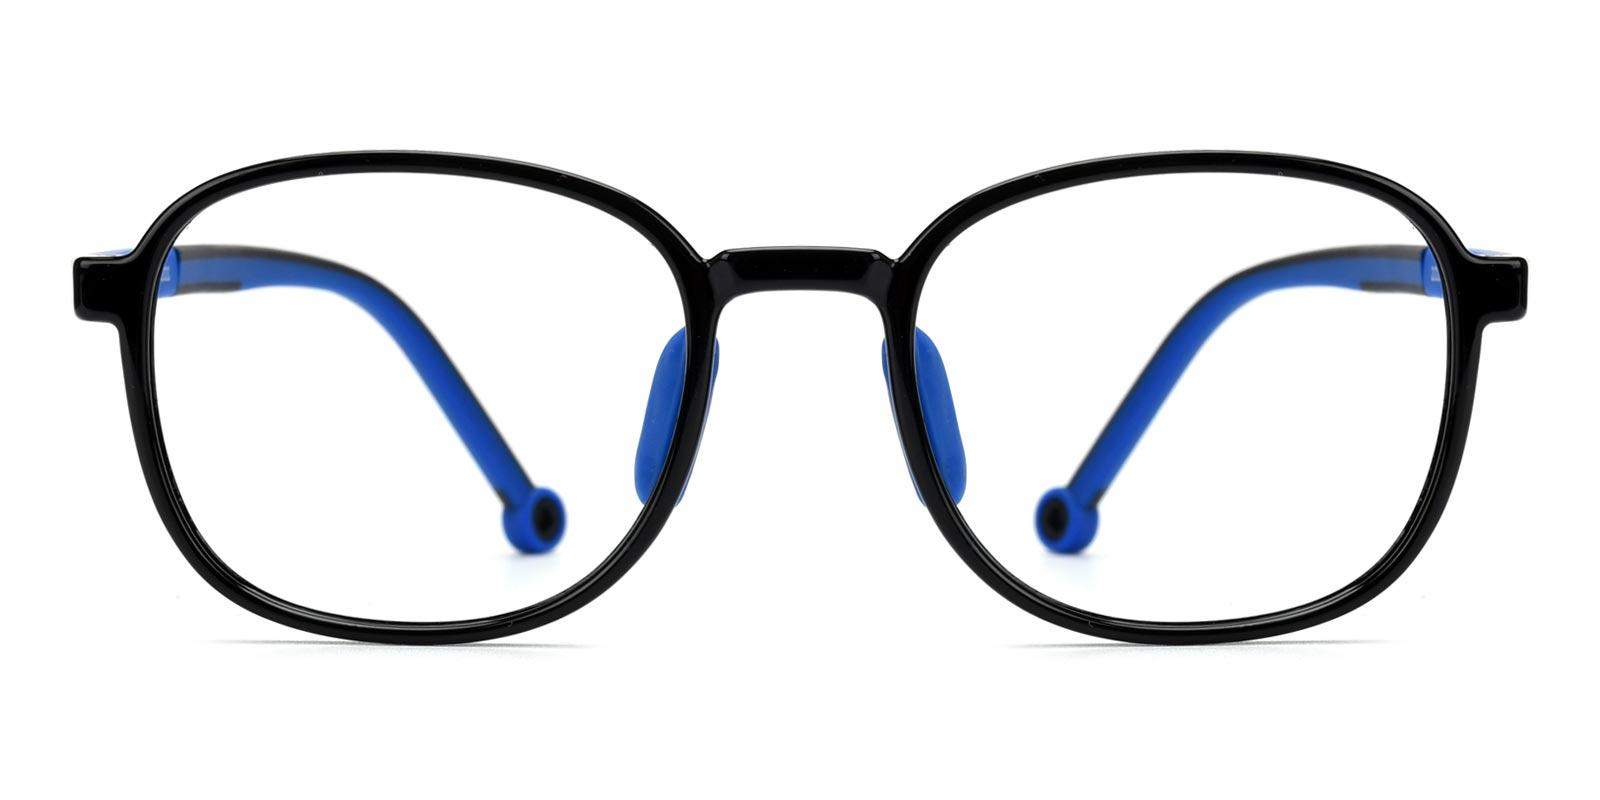 Warren-Black-Rectangle / Round-Plastic-Eyeglasses-detail